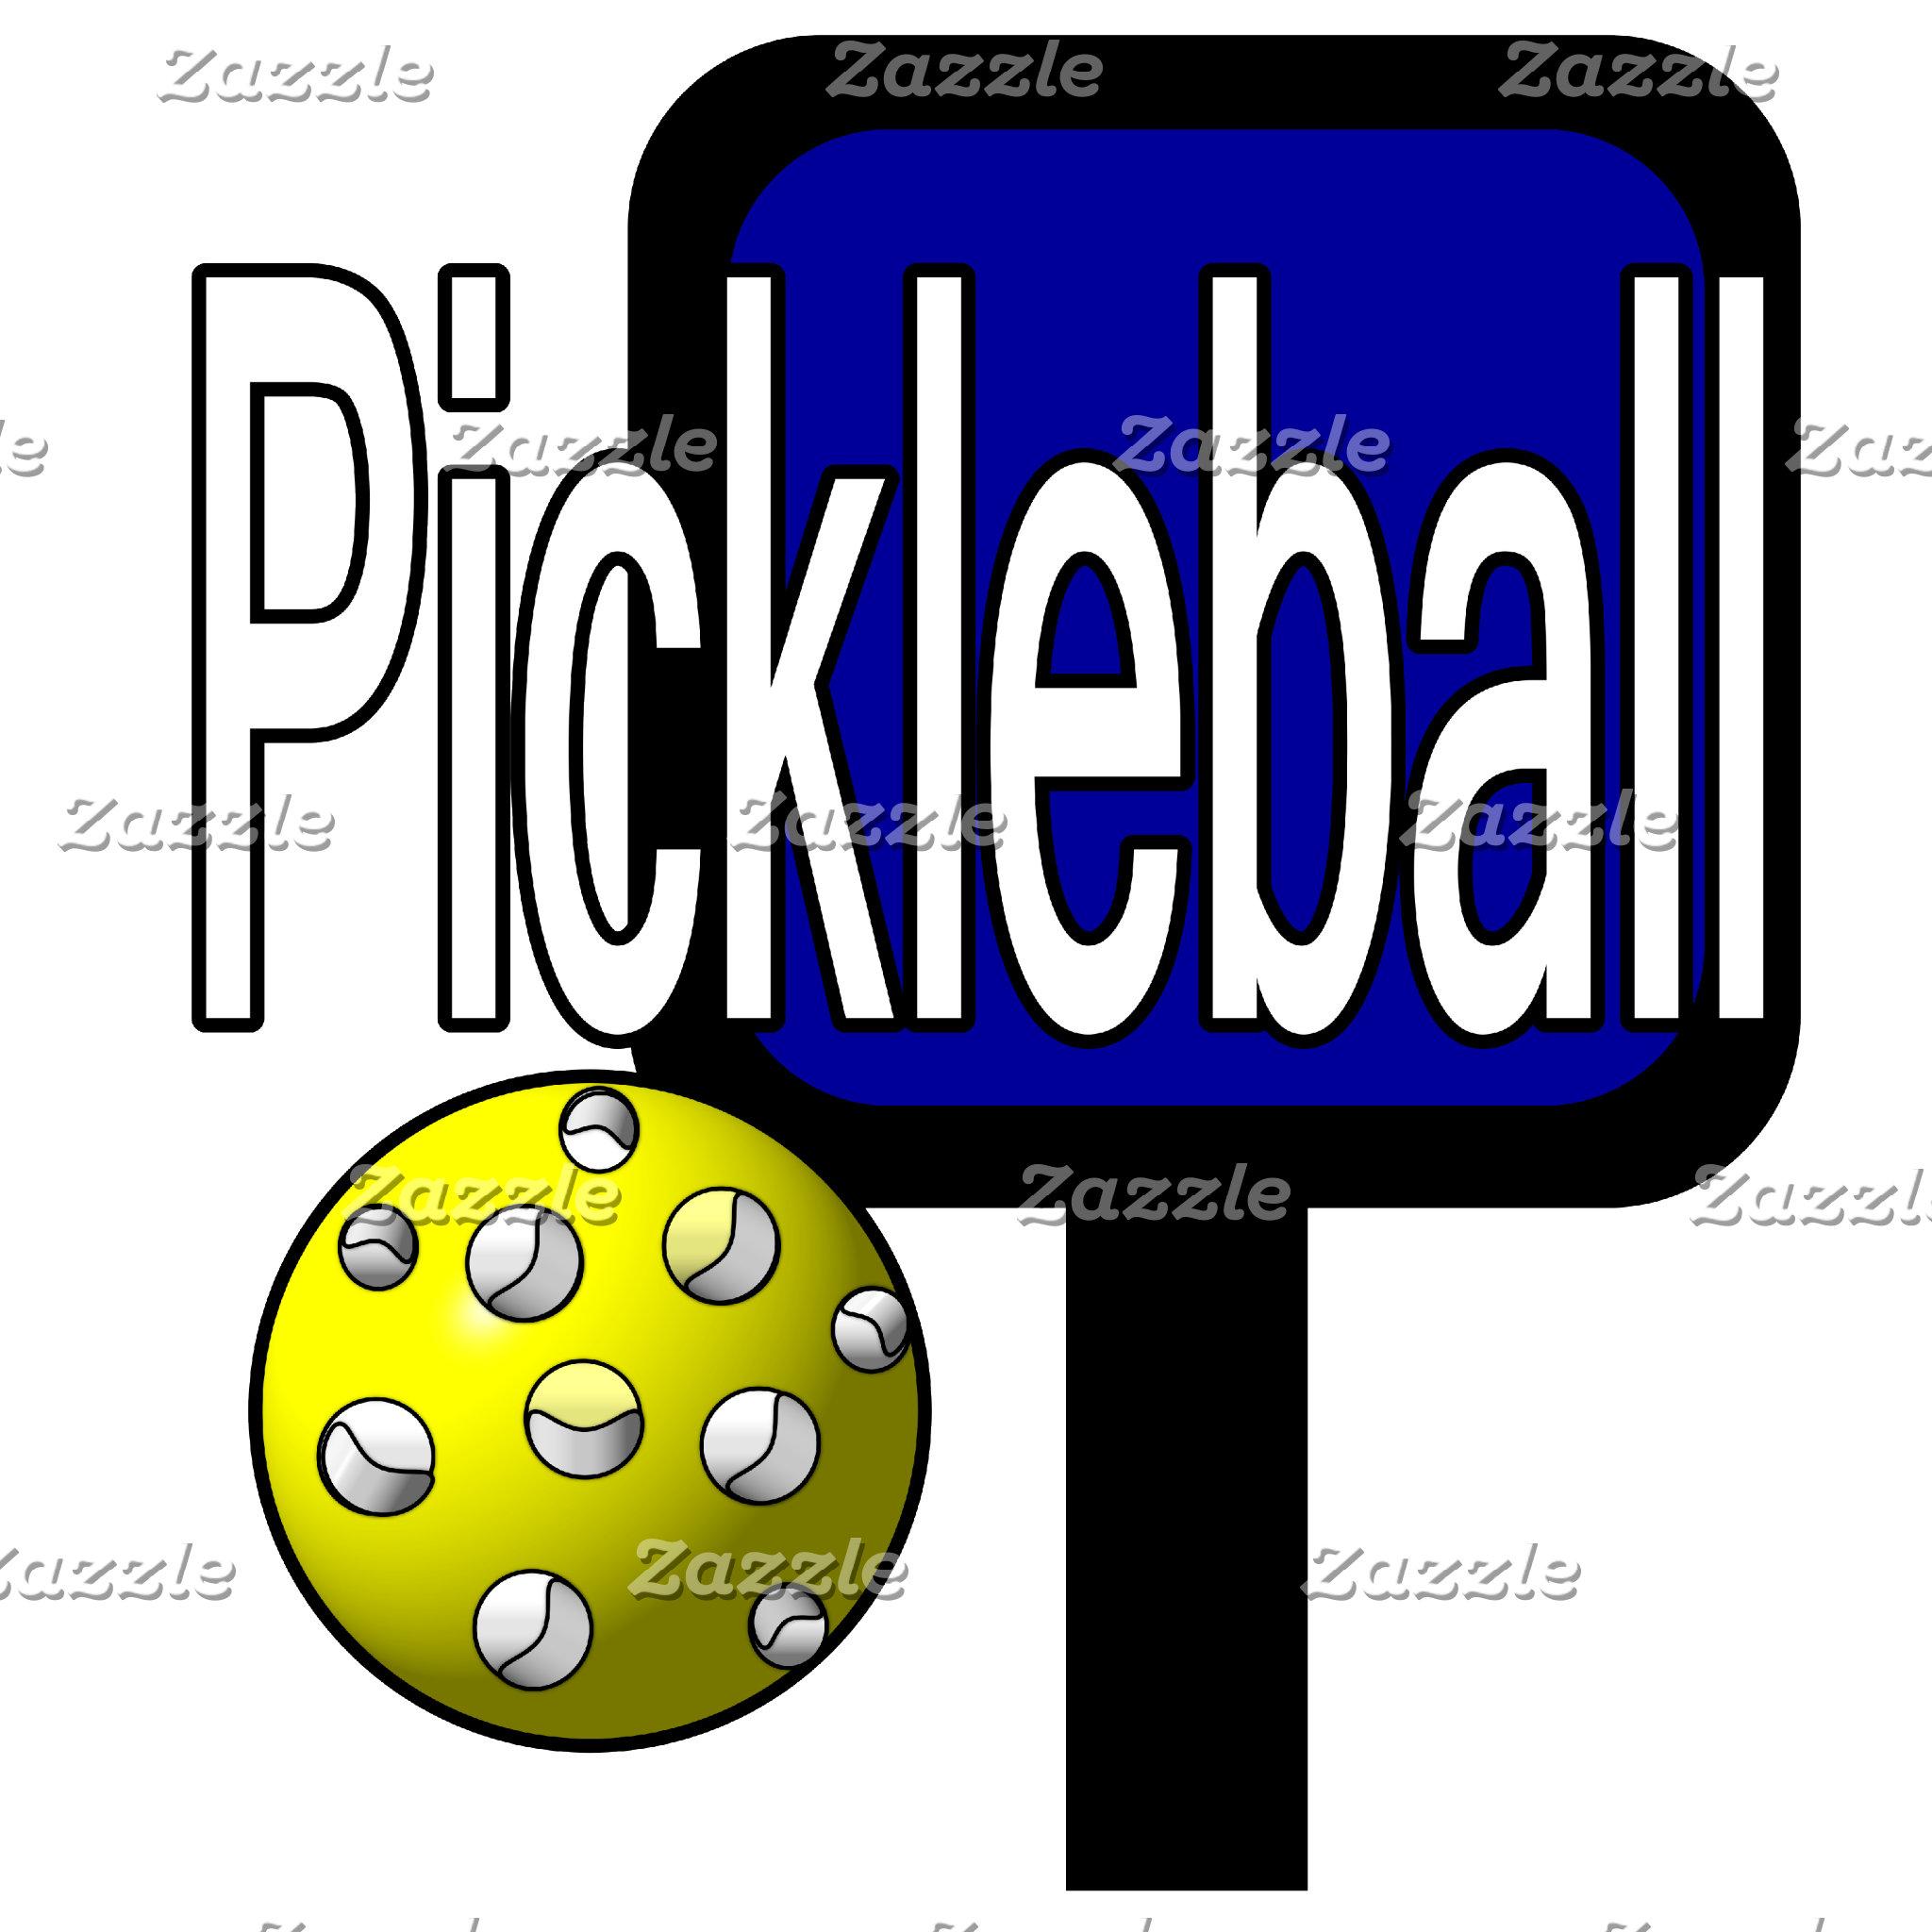 Pickleball designs, Pickleball product, pickelball